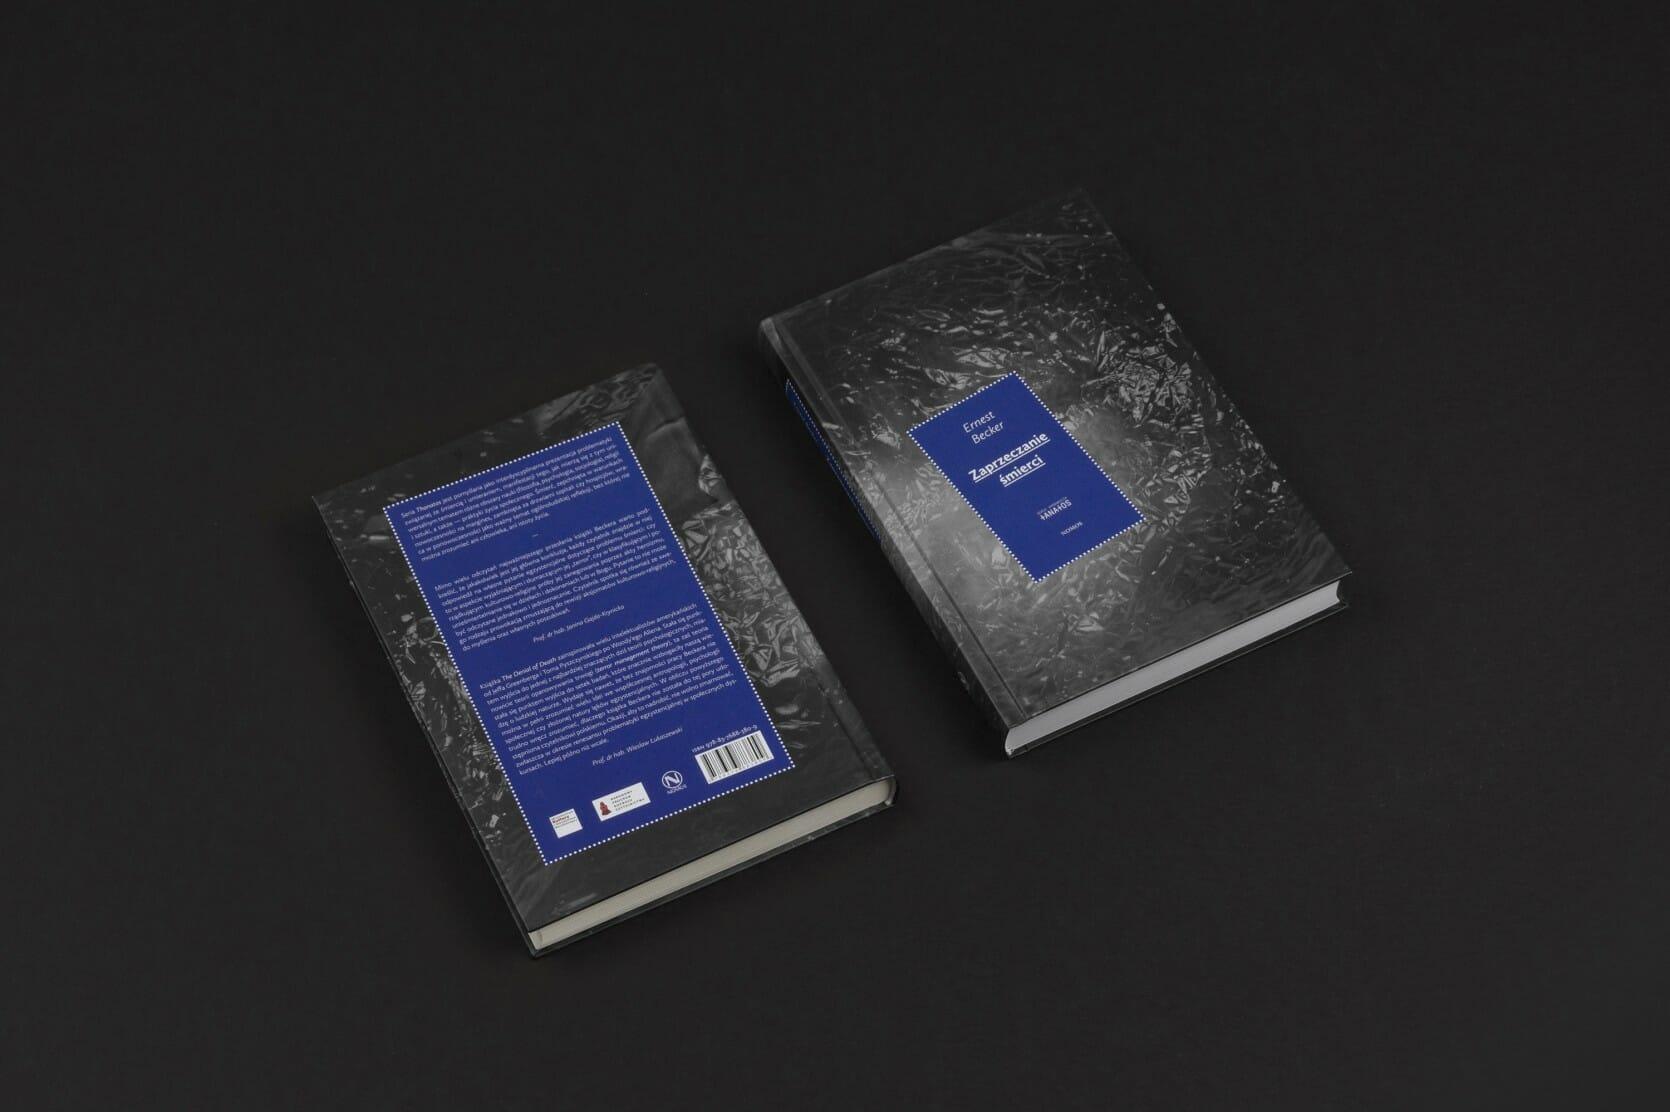 Thanatos Book Series - volume 1 - The Denial of Death by Ernest Becker